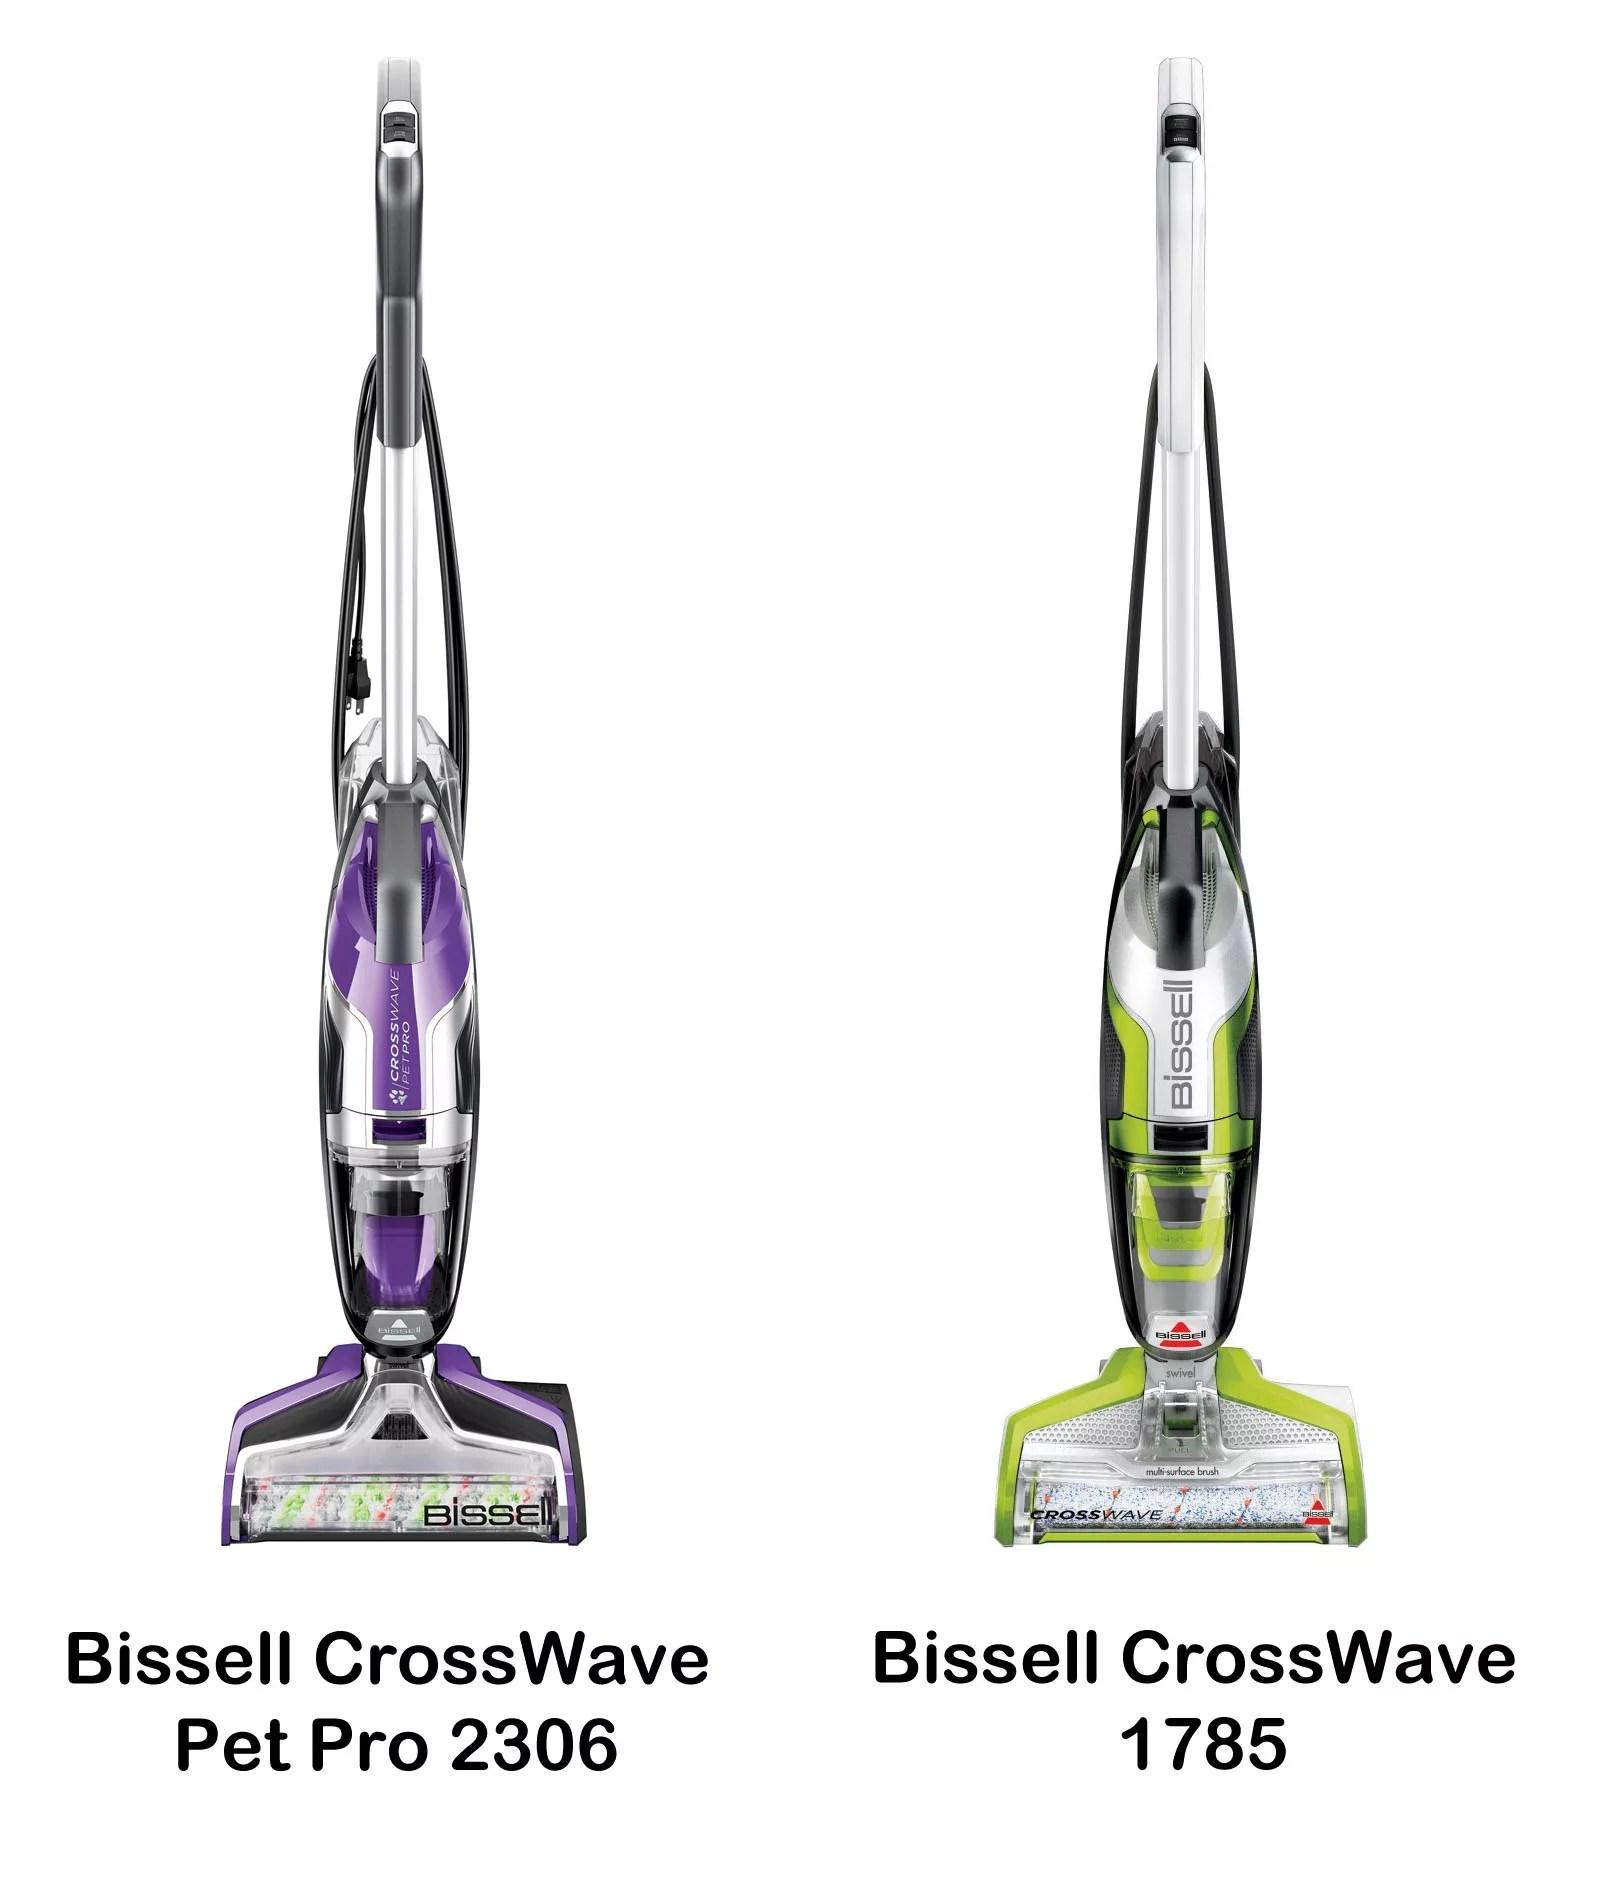 Bissell Crosswave Pet Pro Purple Version Vs Bissell